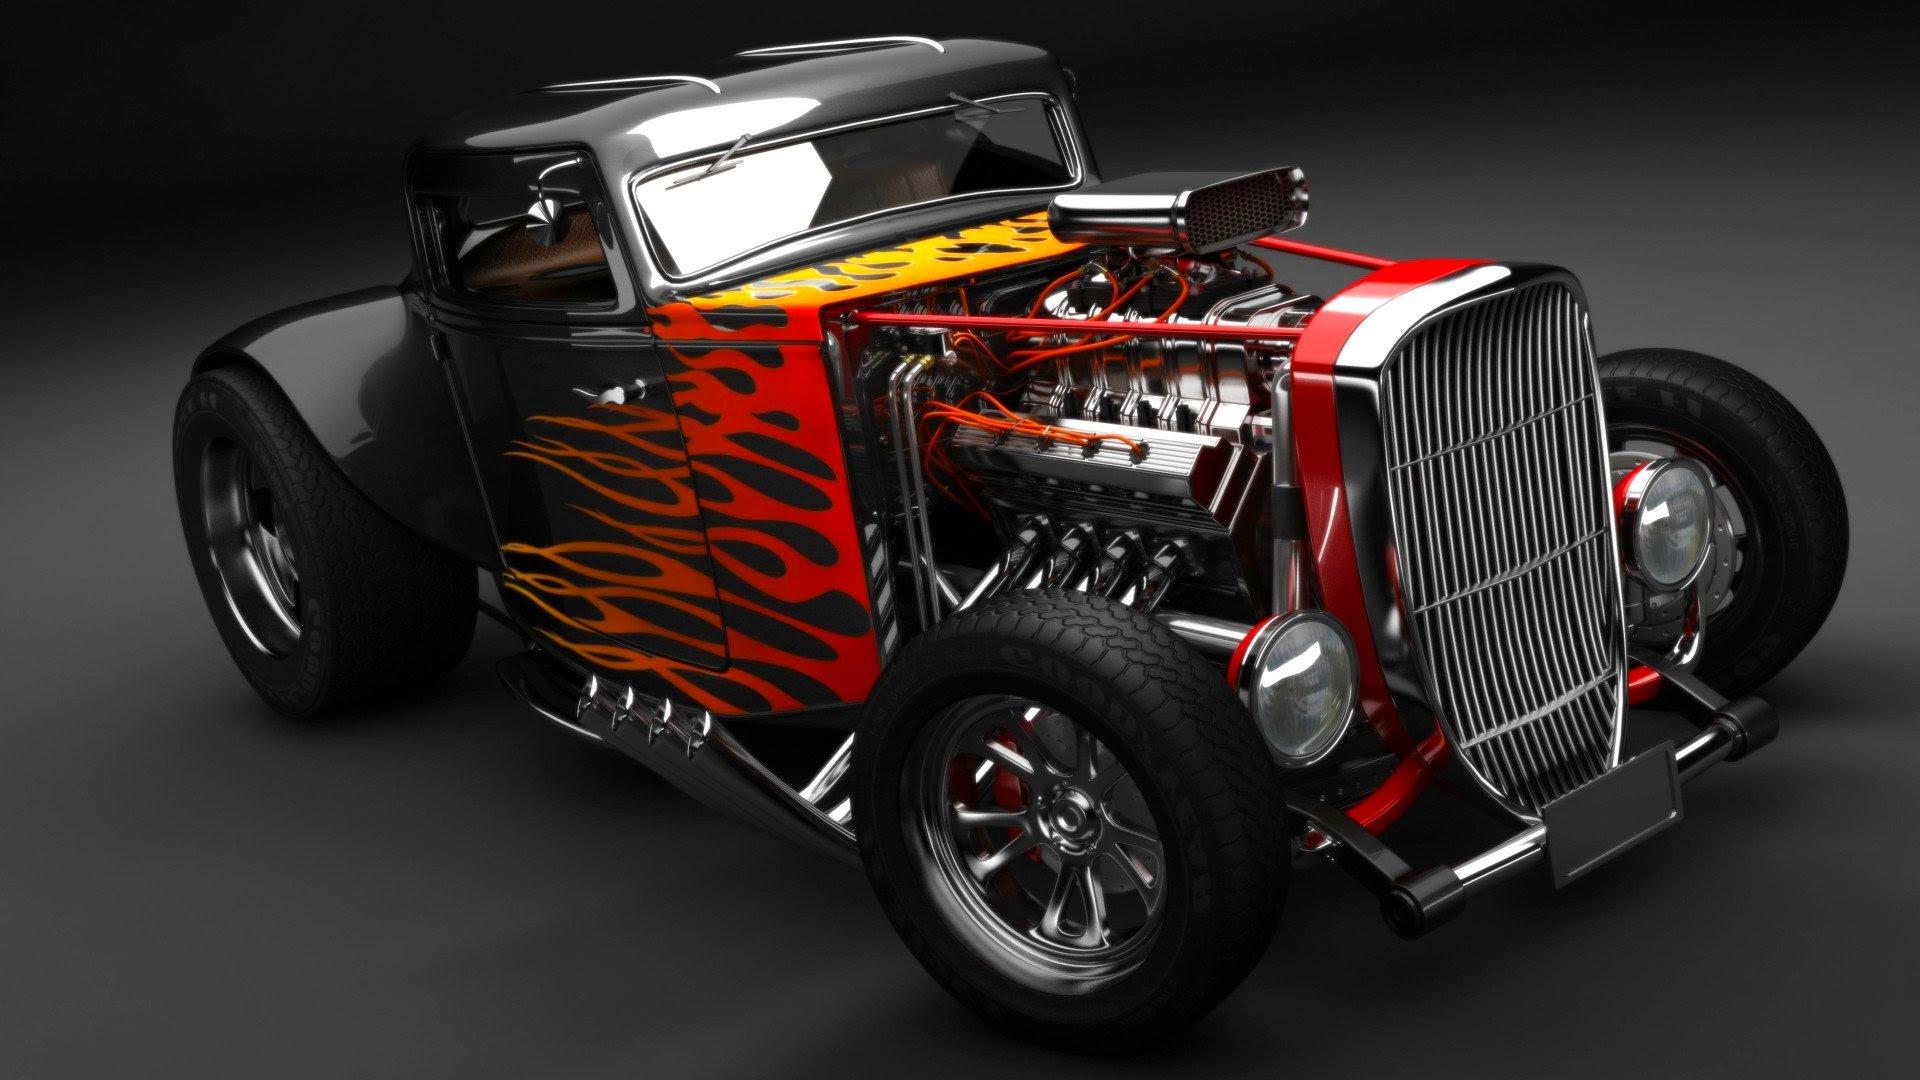 HOT ROD rods custom street muscle streetrod hotrod wallpaper  1920x1080  947854  WallpaperUP